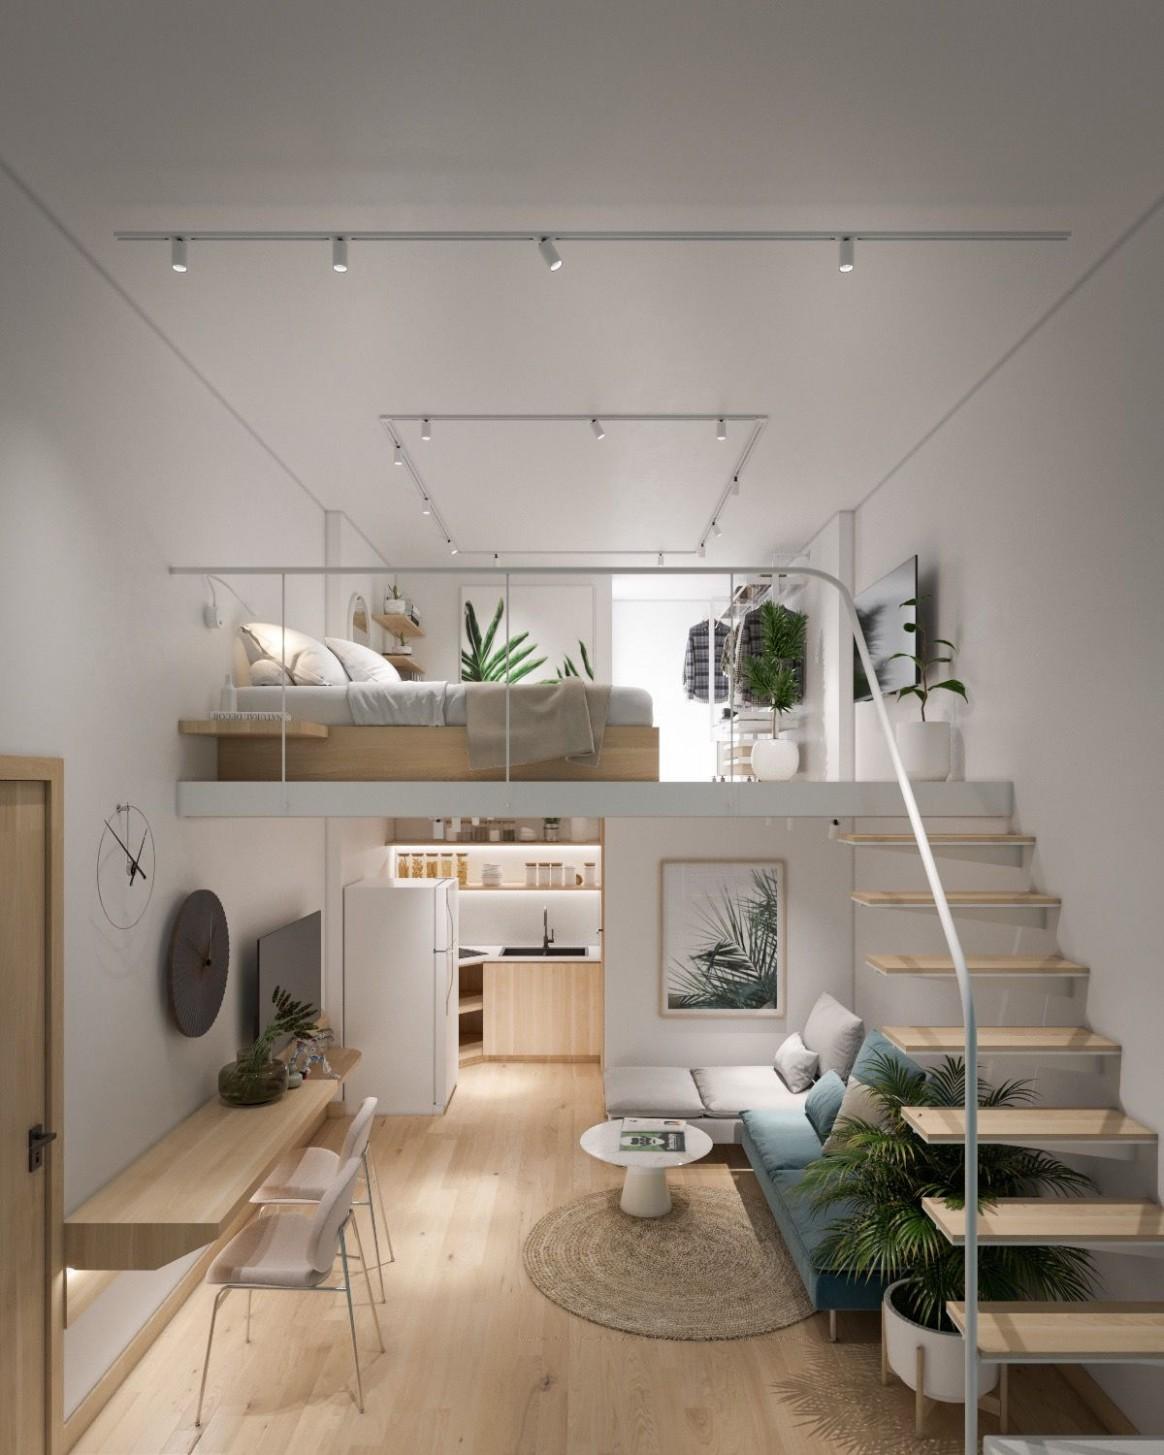 12 Inspirational Lofted Bedroom Layouts in 12  Small loft  - Apartment Design Minimalist